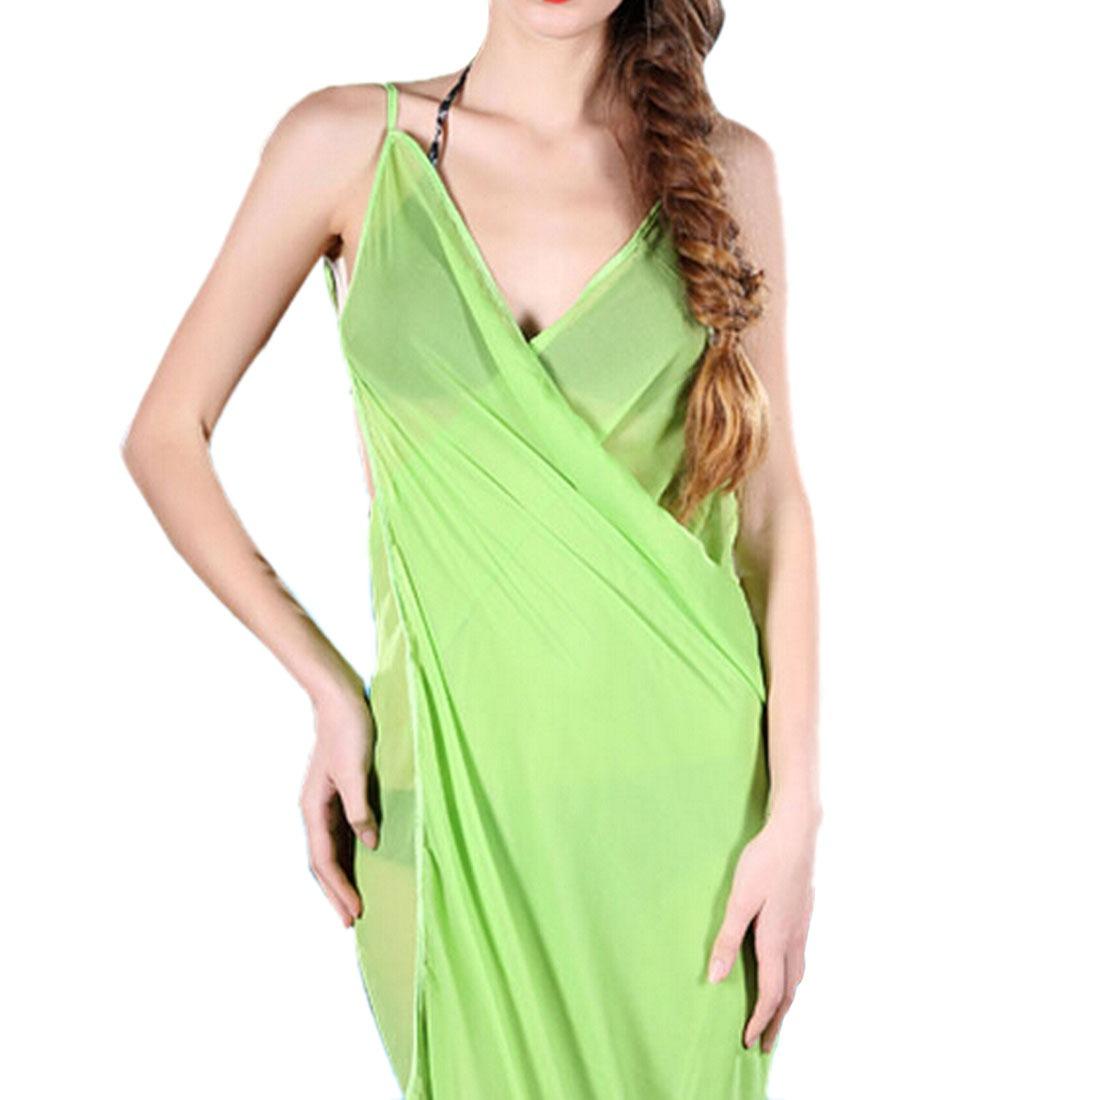 Beach Towel Womens: Sexy Solid Color Women Summer Bath Towel Beach Dress